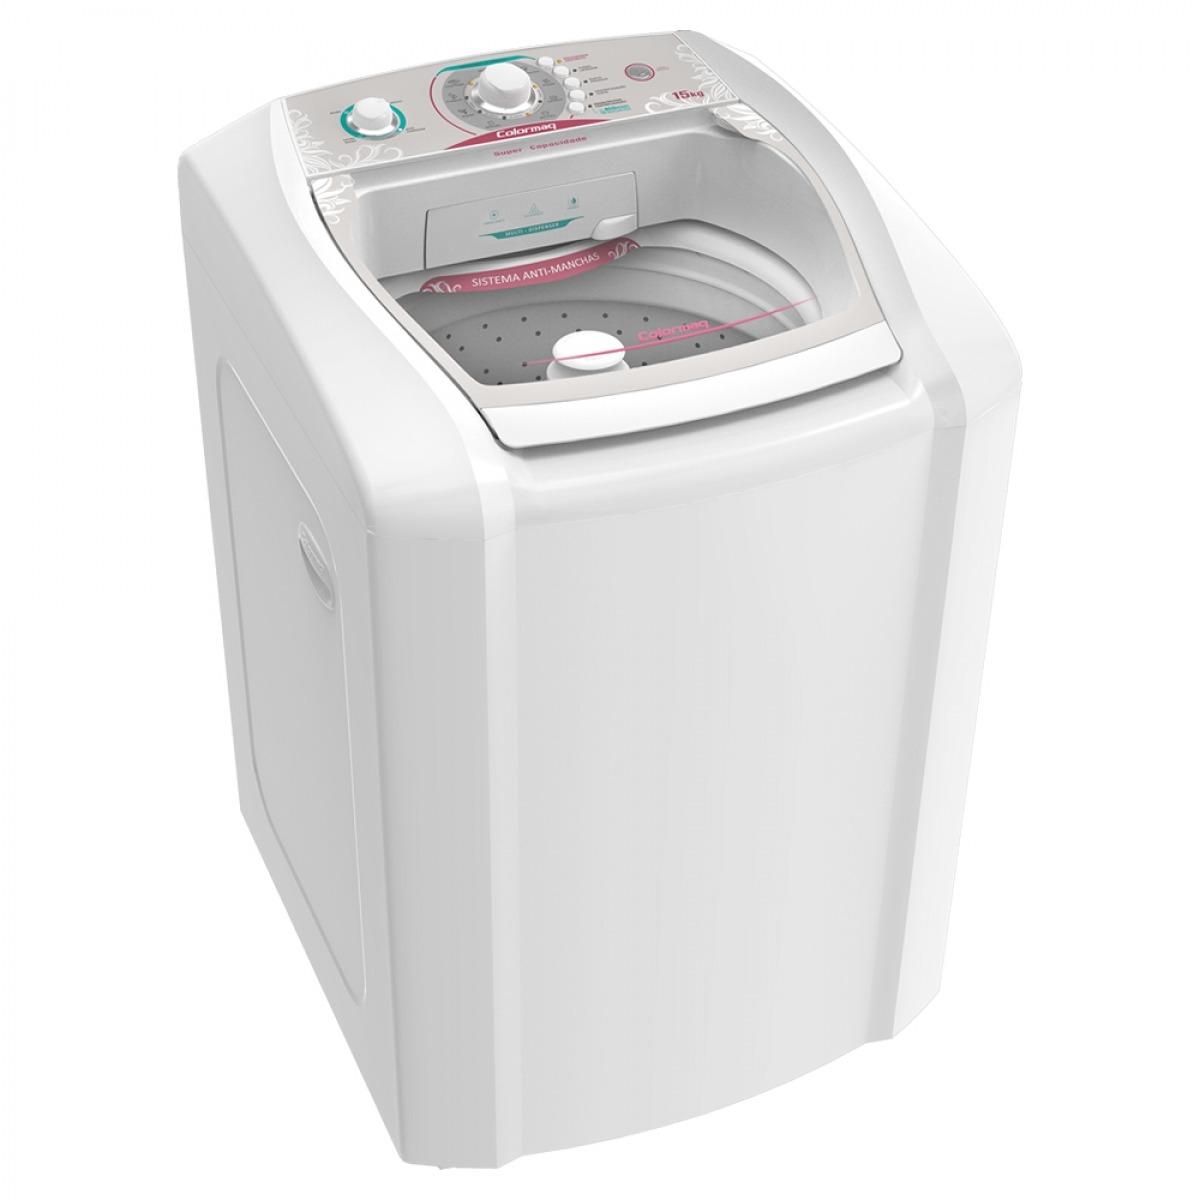 Lavadora automatica lca15 br 220v